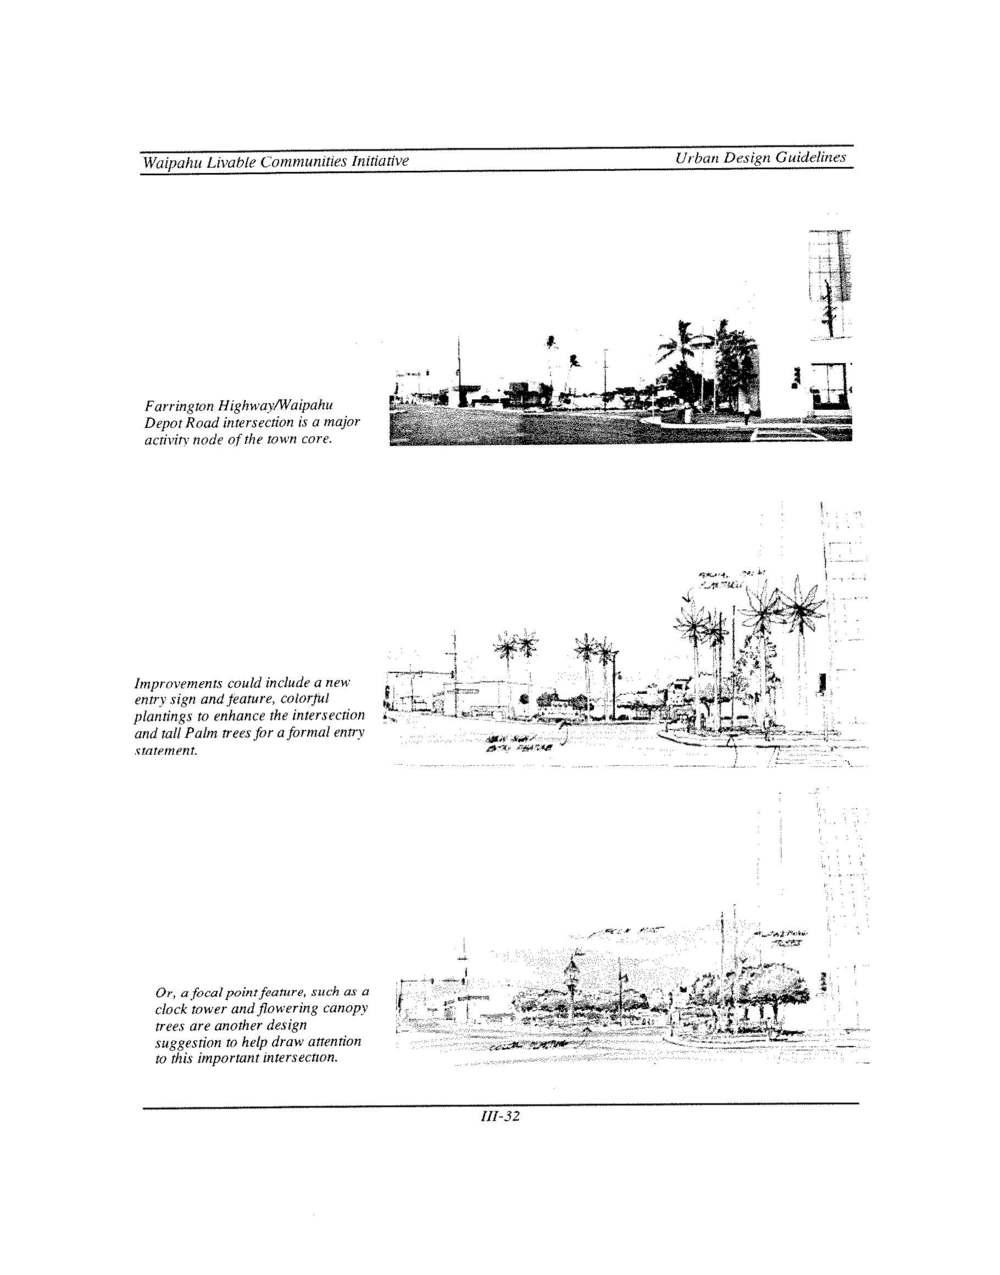 160531_WaipahuLivableCommunities(1998)_Page_122.jpg